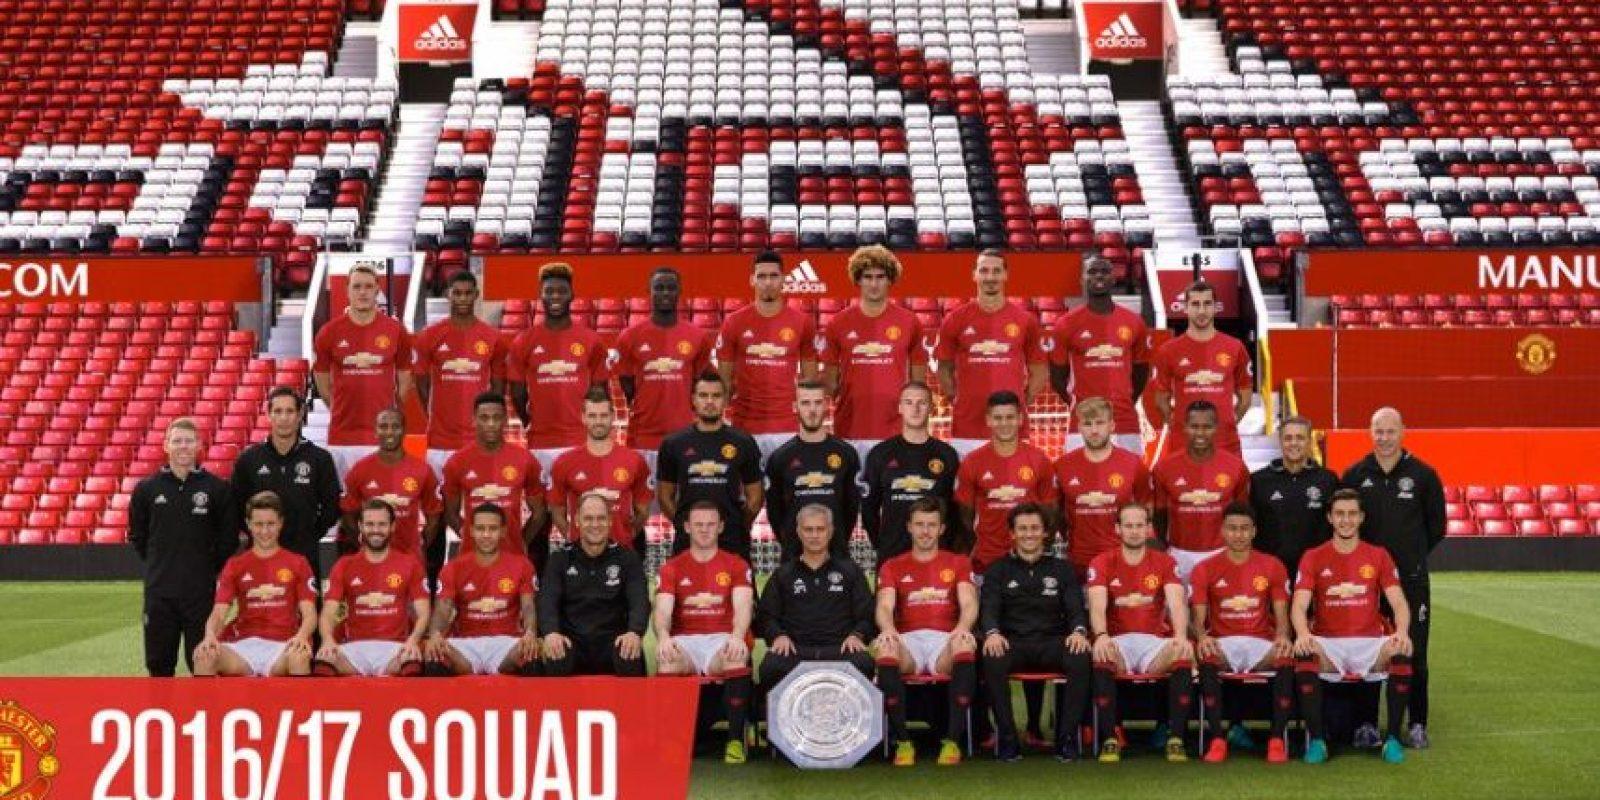 Bastian Schweinsteiger fue excluido de la fotografía oficial de Manchester United Foto:Twitter Manchester United